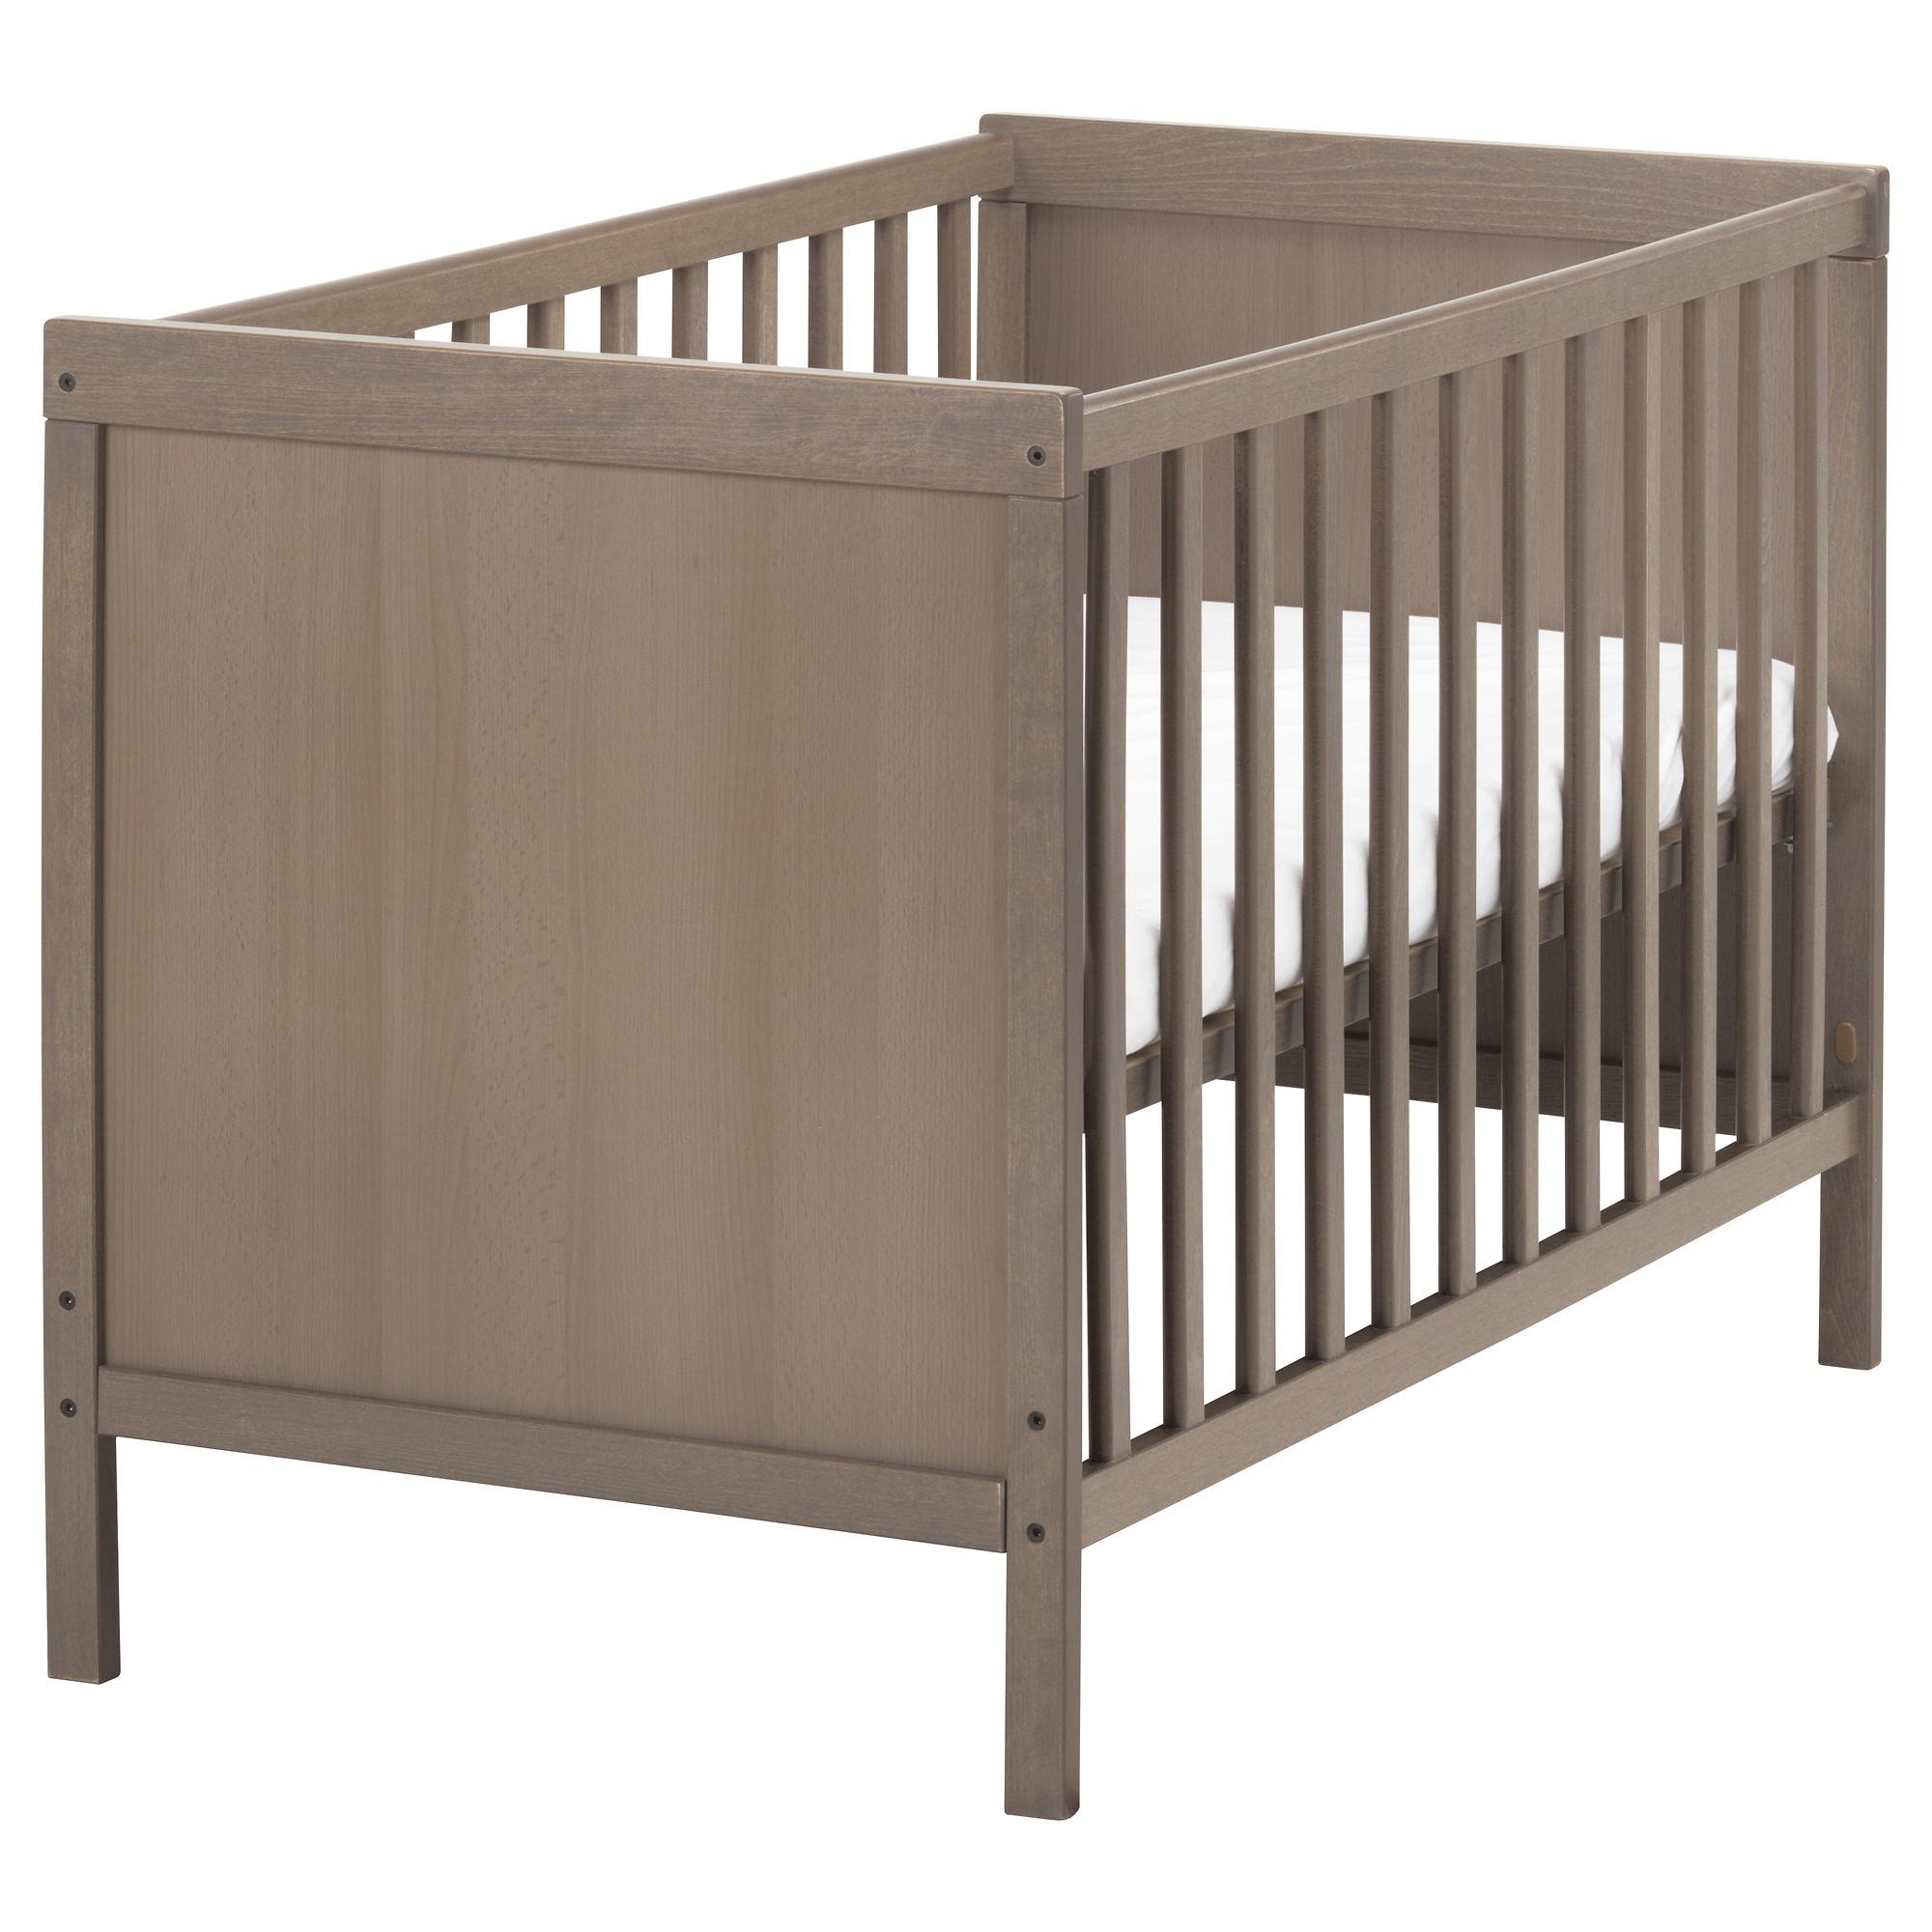 ikea babybett sundvik elternbewertungen. Black Bedroom Furniture Sets. Home Design Ideas